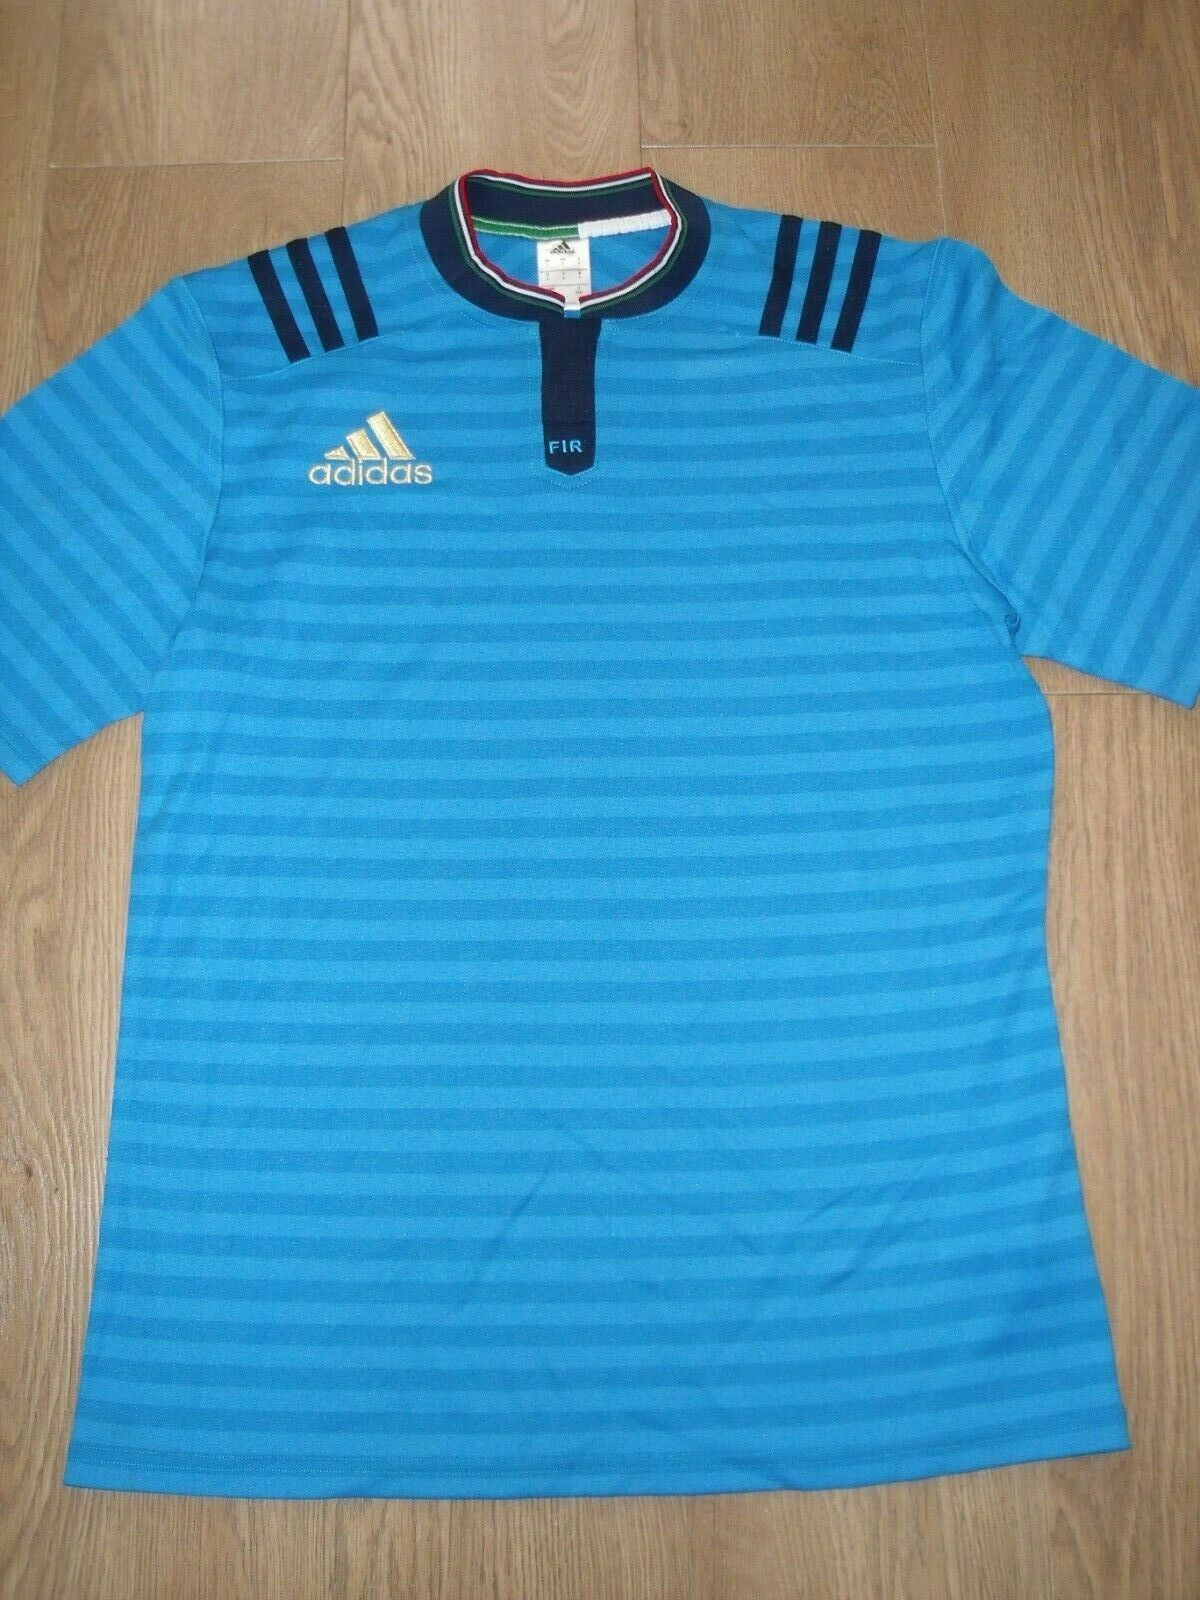 Fir f. I.R Italien Italien Italien Italia Adidas Rugby Trikot Hemd Blau Gestreift HERREN L Neu b71700